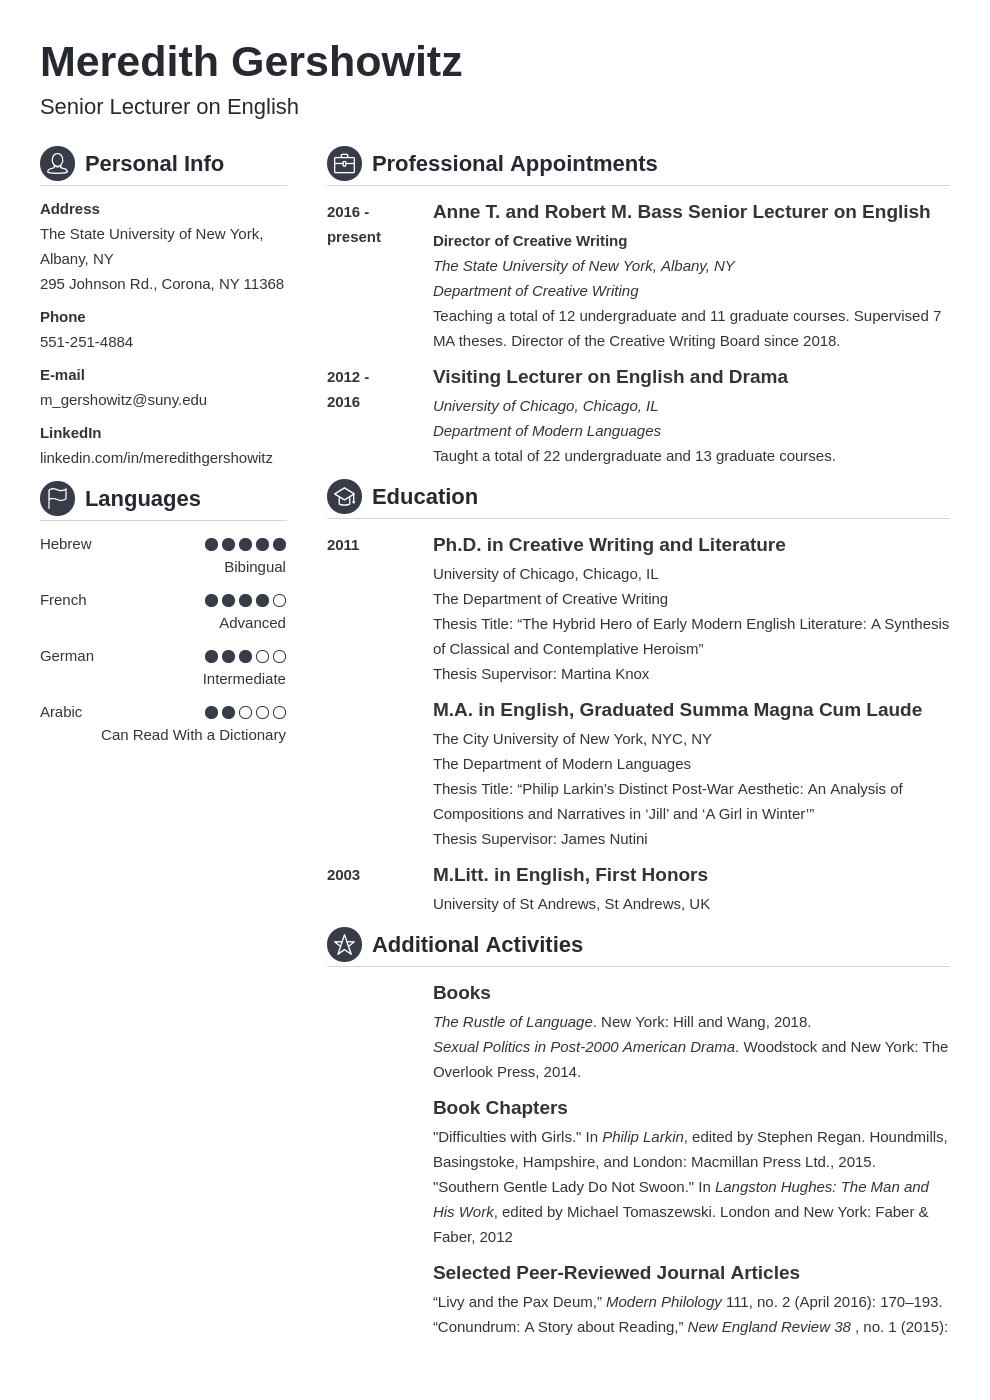 cv academic template crisp uk